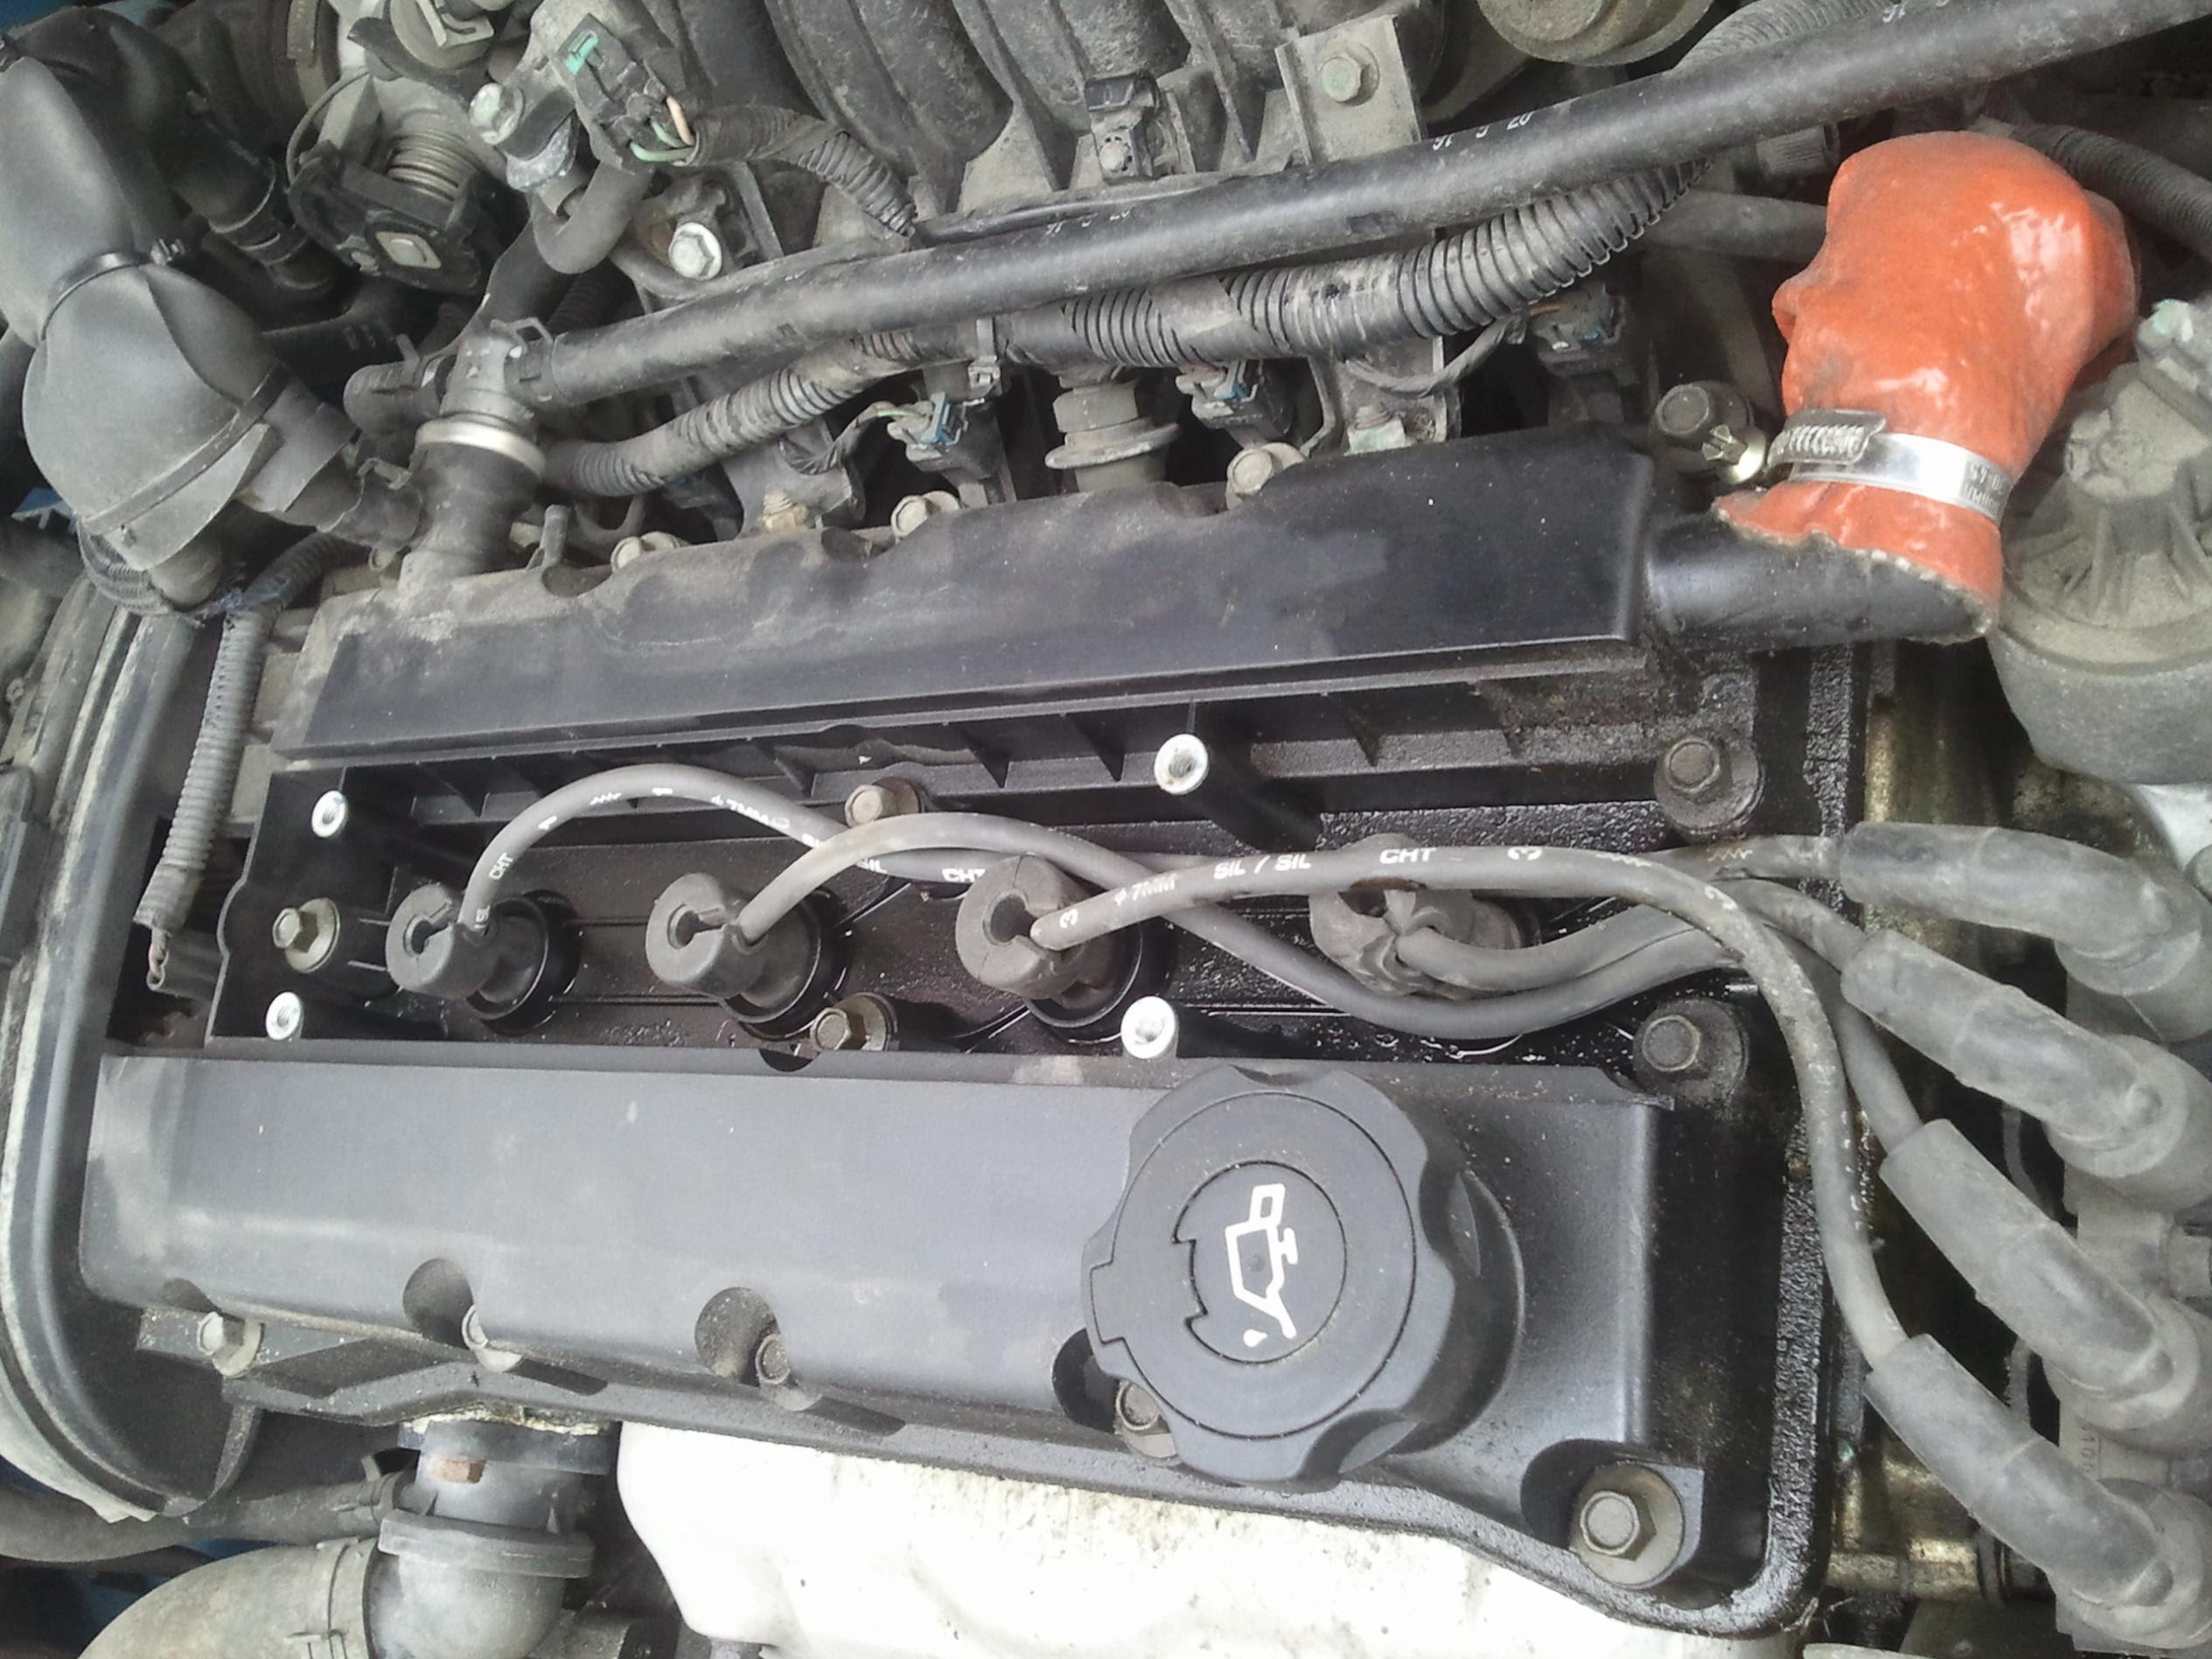 2007 Chevy Aveo Engine Diagram Wiring Diagram Wait Make A Wait Make A Cfcarsnoleggio It